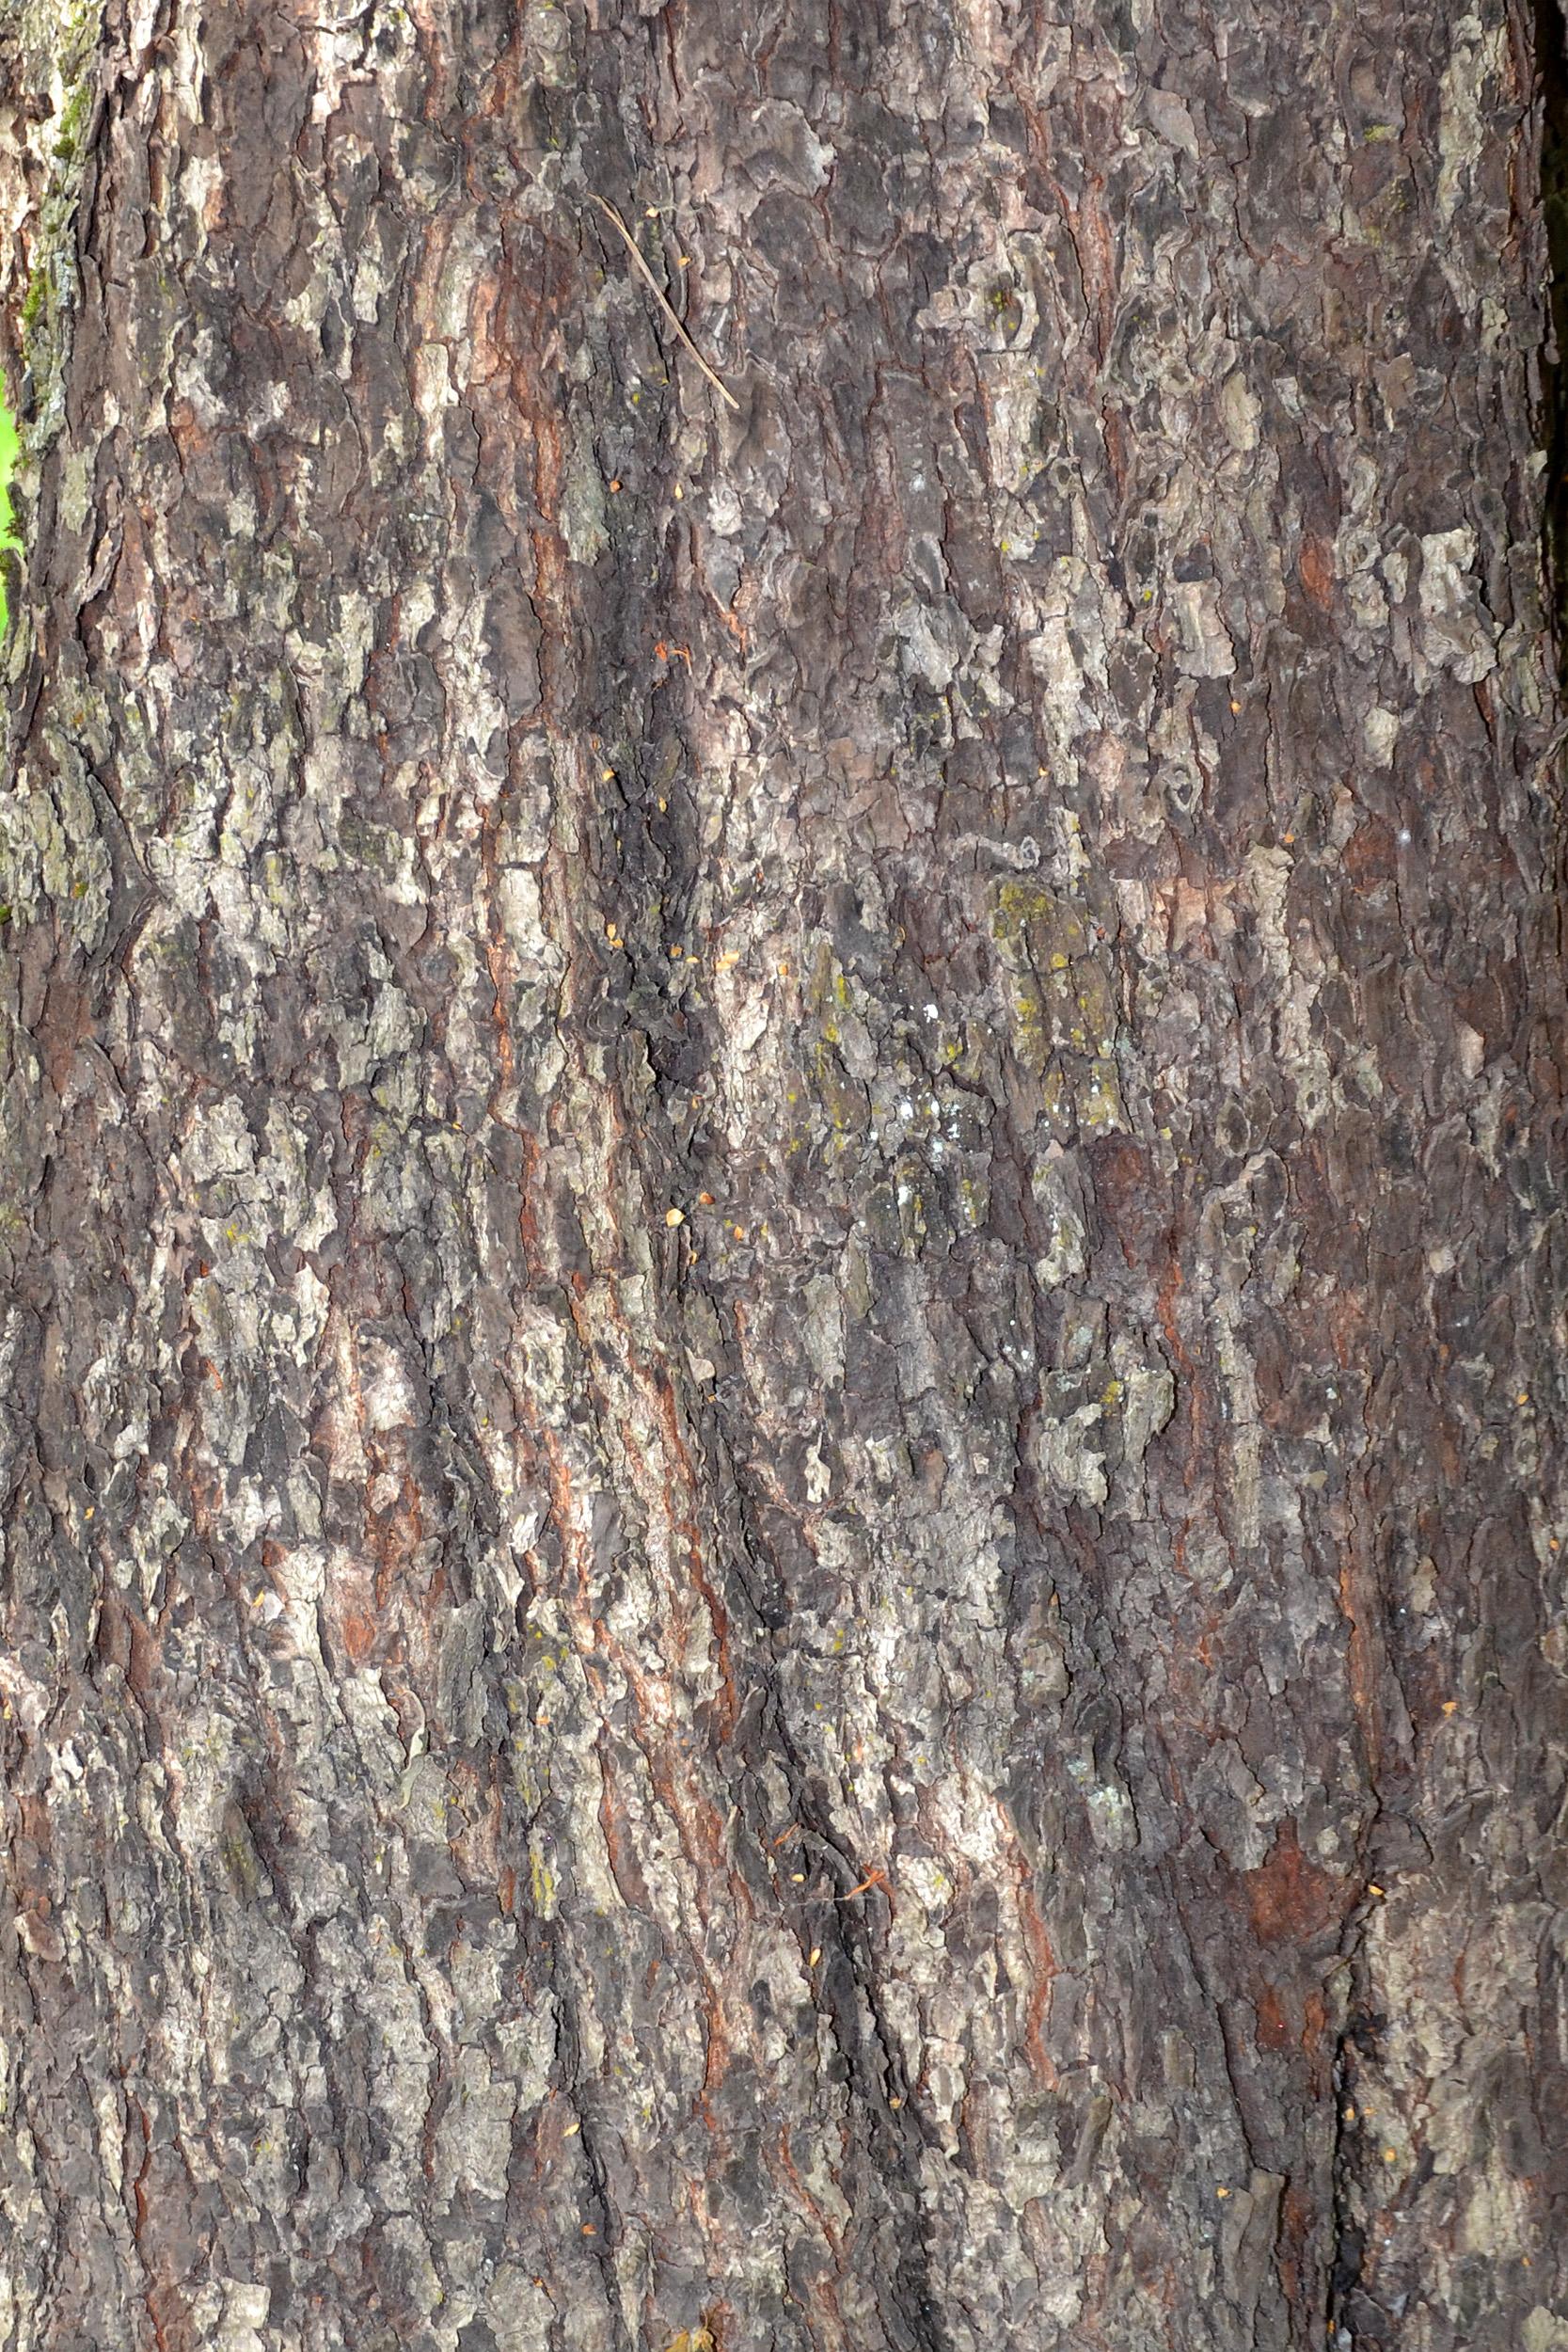 Bark of wild service tree photo